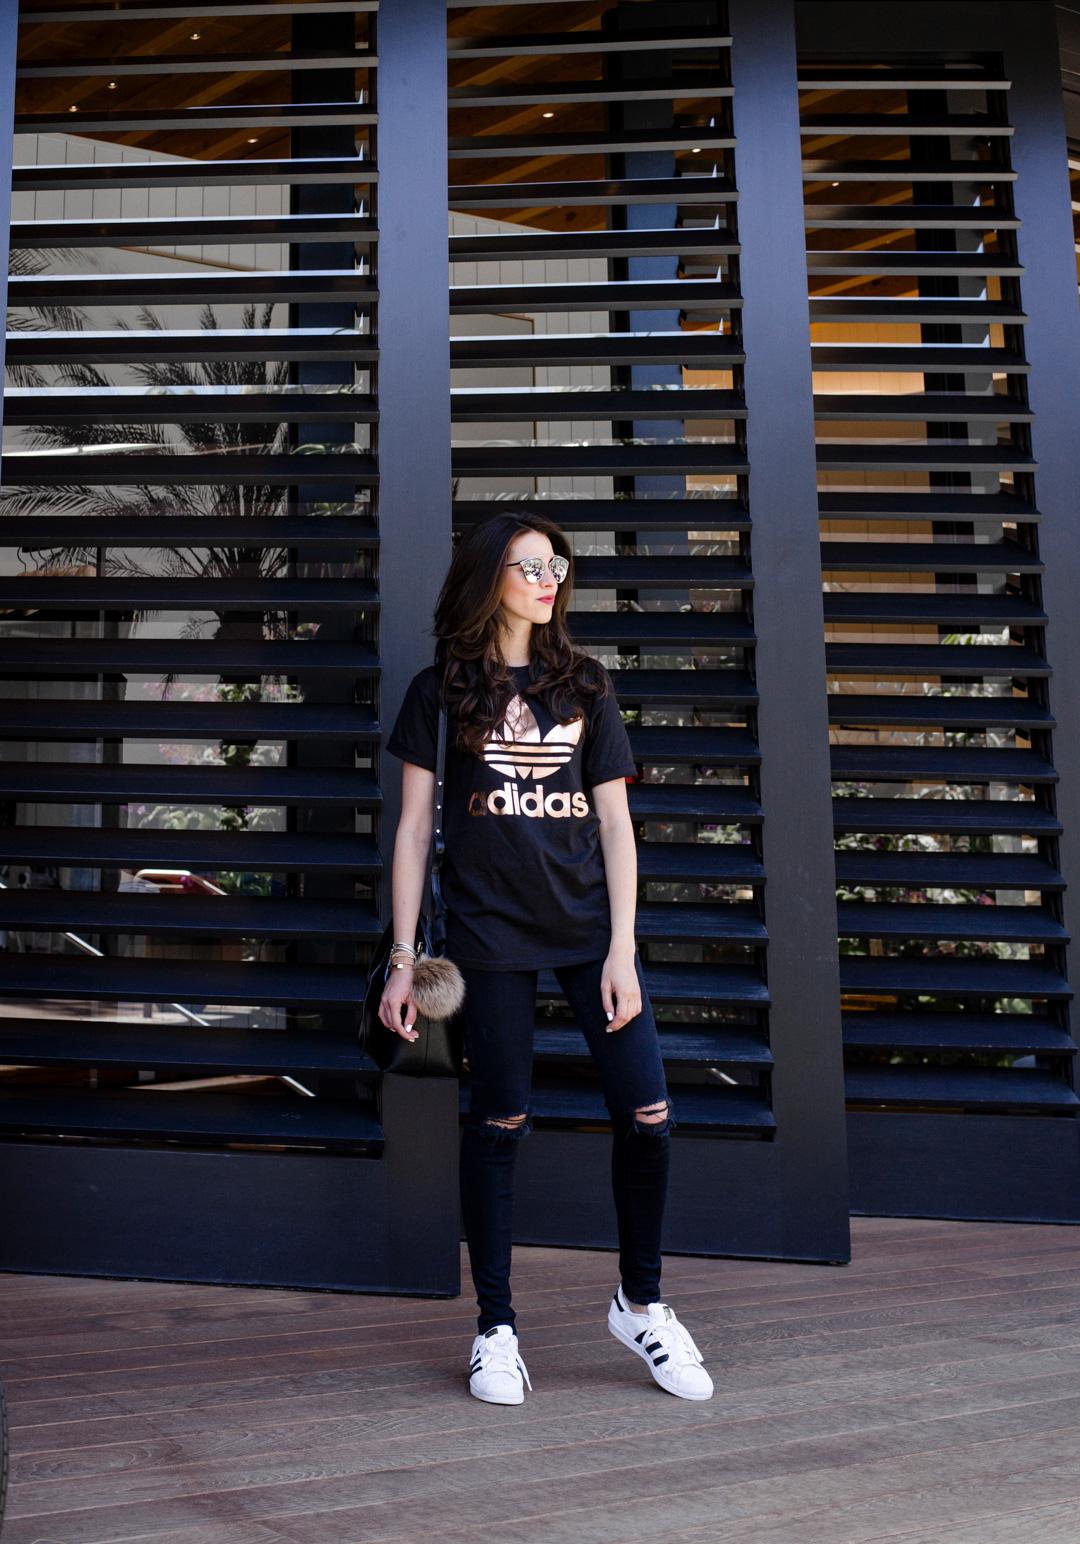 Dash of Panache styling Adidas, J Brand Jeans and a Mansur Gavriel Bucket Bag